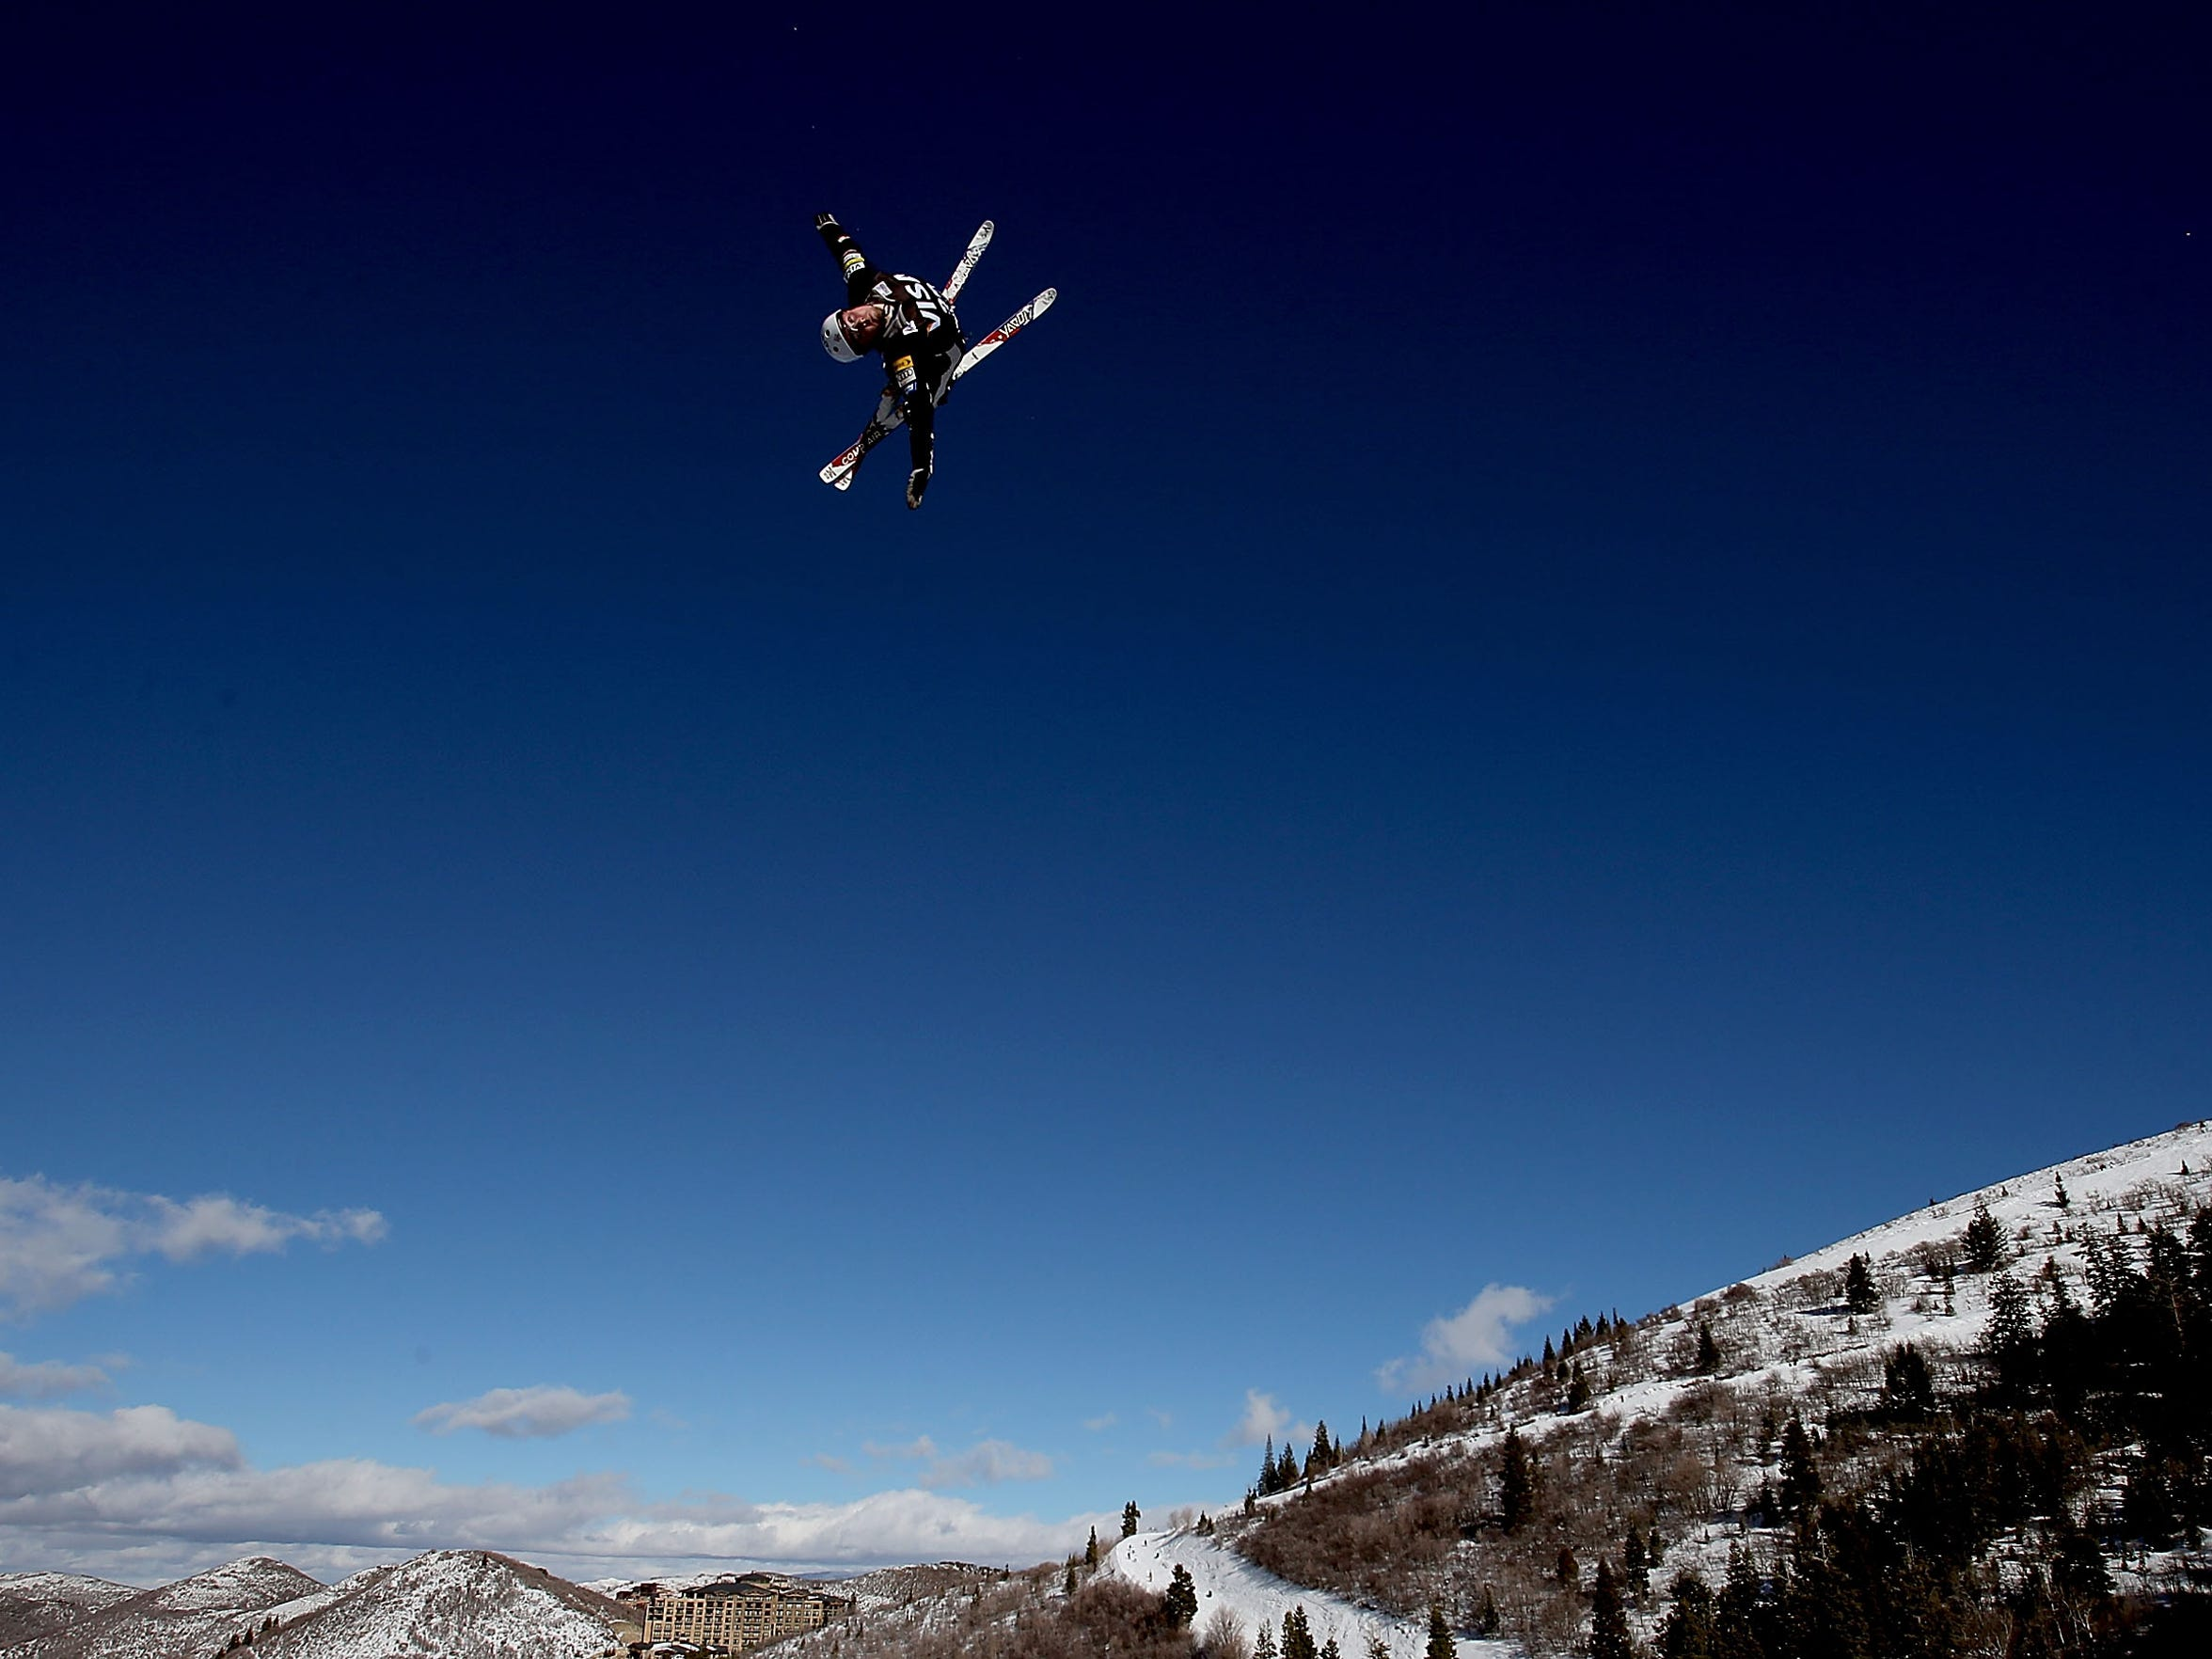 Jonathon Lillis #20 jumps while training for the Mens